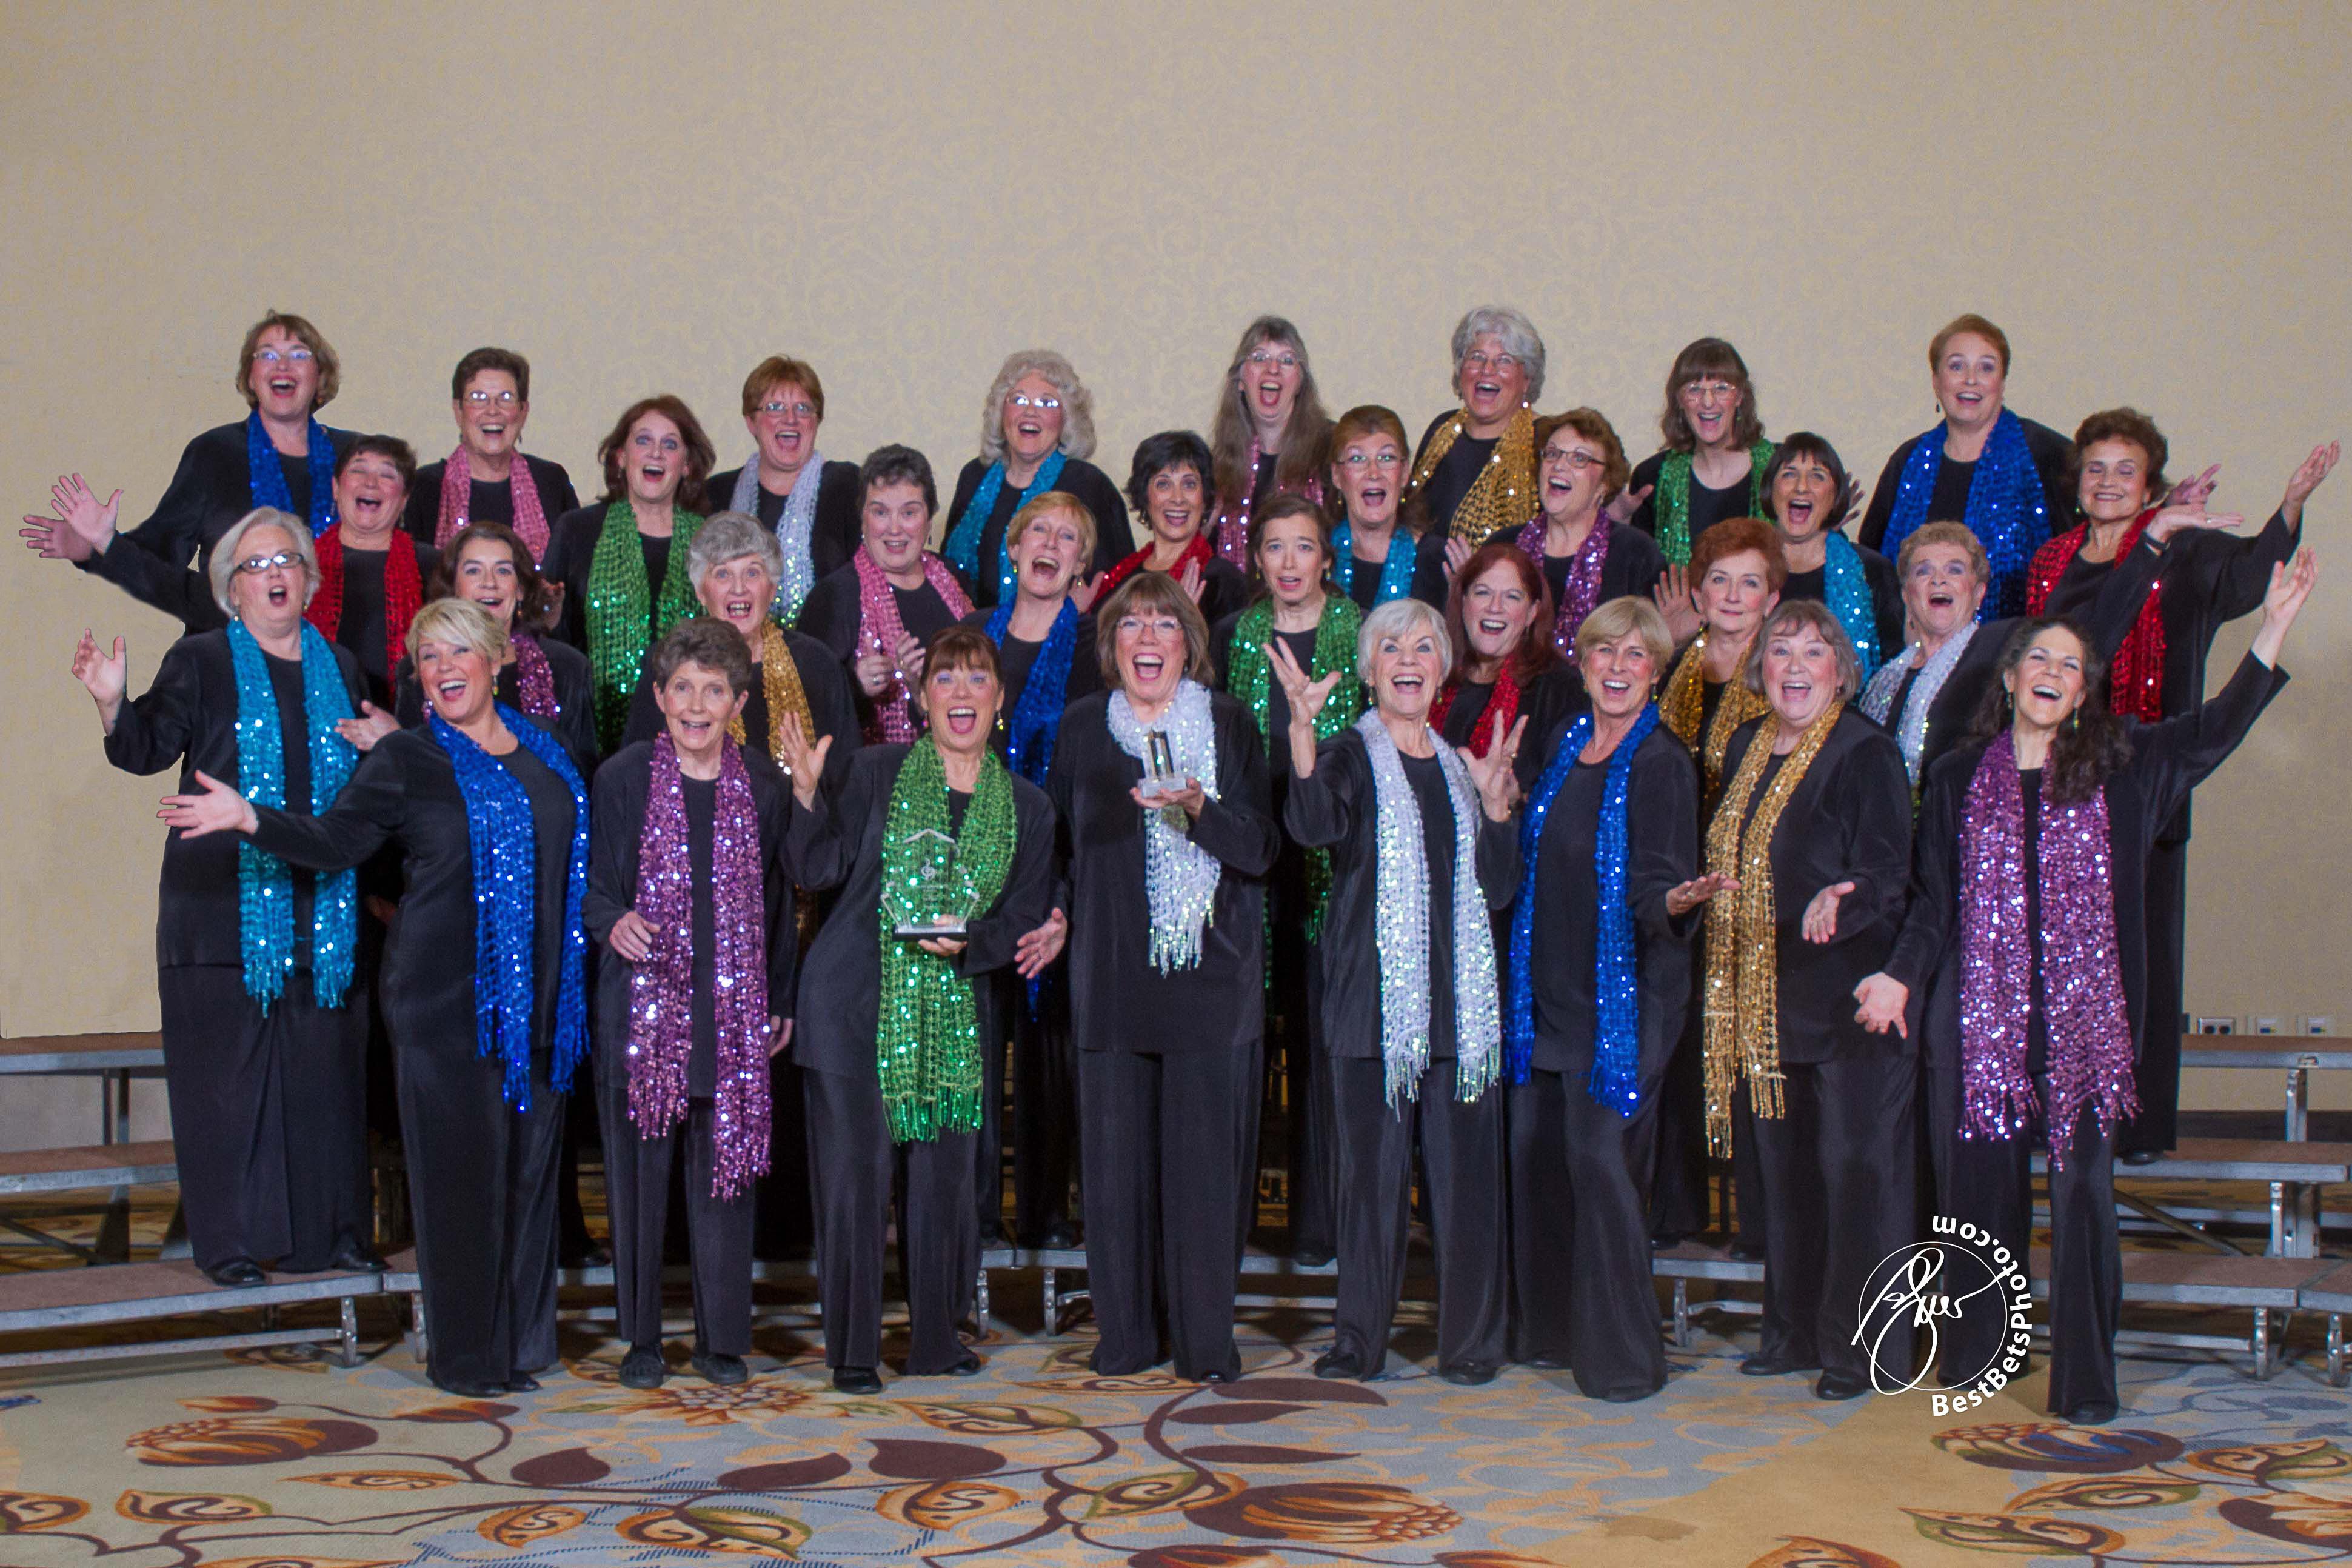 Pennsylvania Choral Harmony Iccphotoshopped